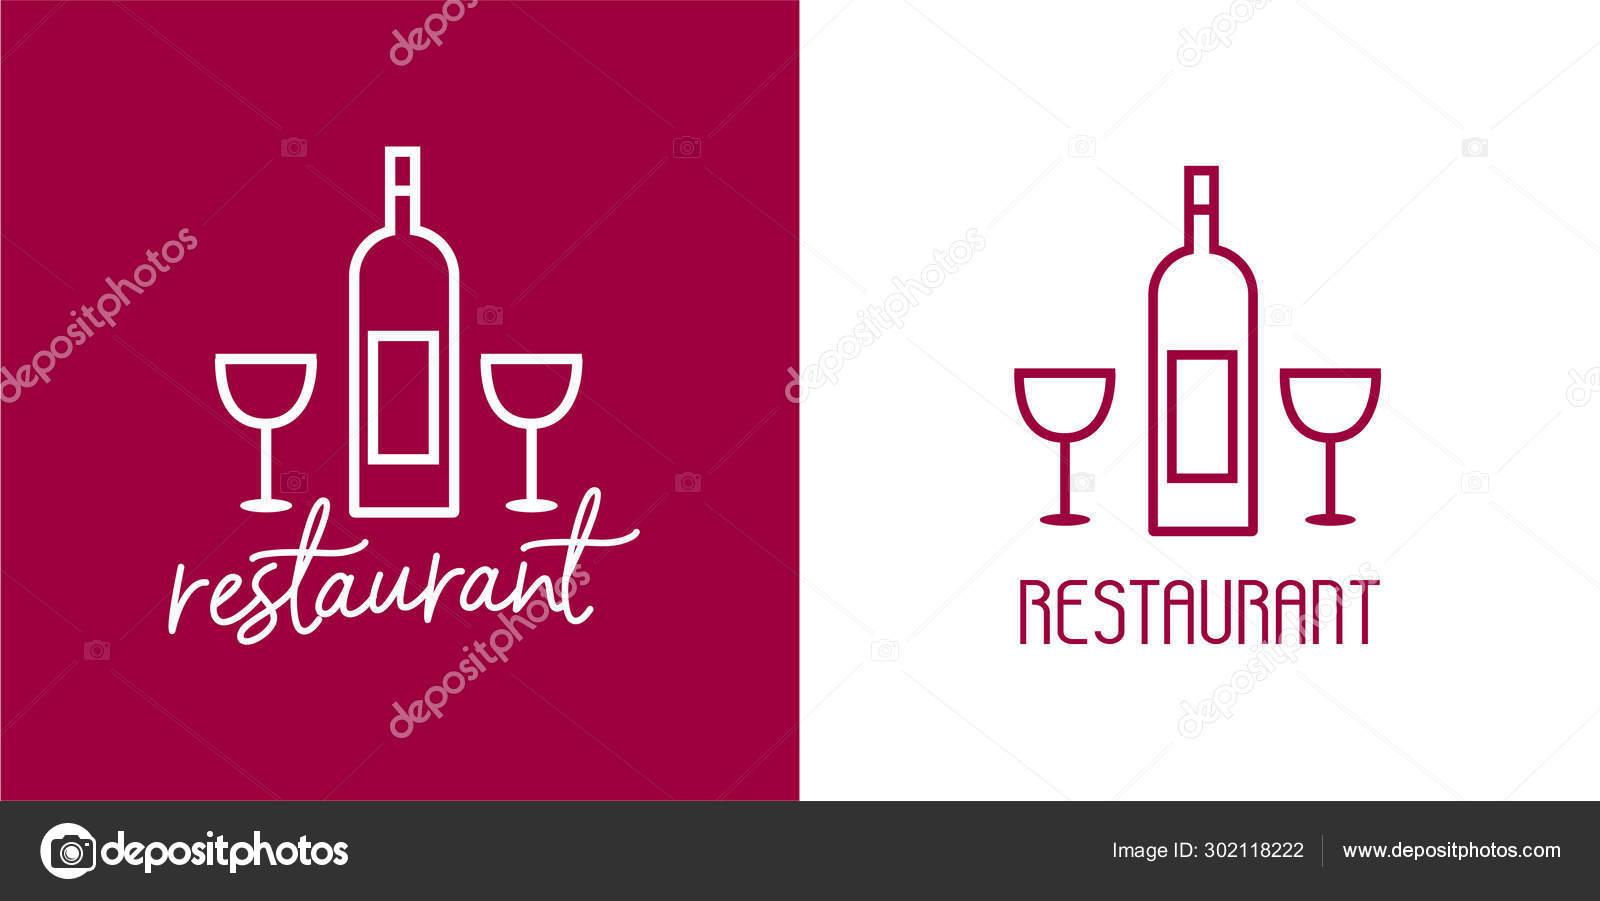 Modern Elegant Restaurant Logos White Violet Red Vector Isolated Signs Stock Vector C Rainy Helga 302118222